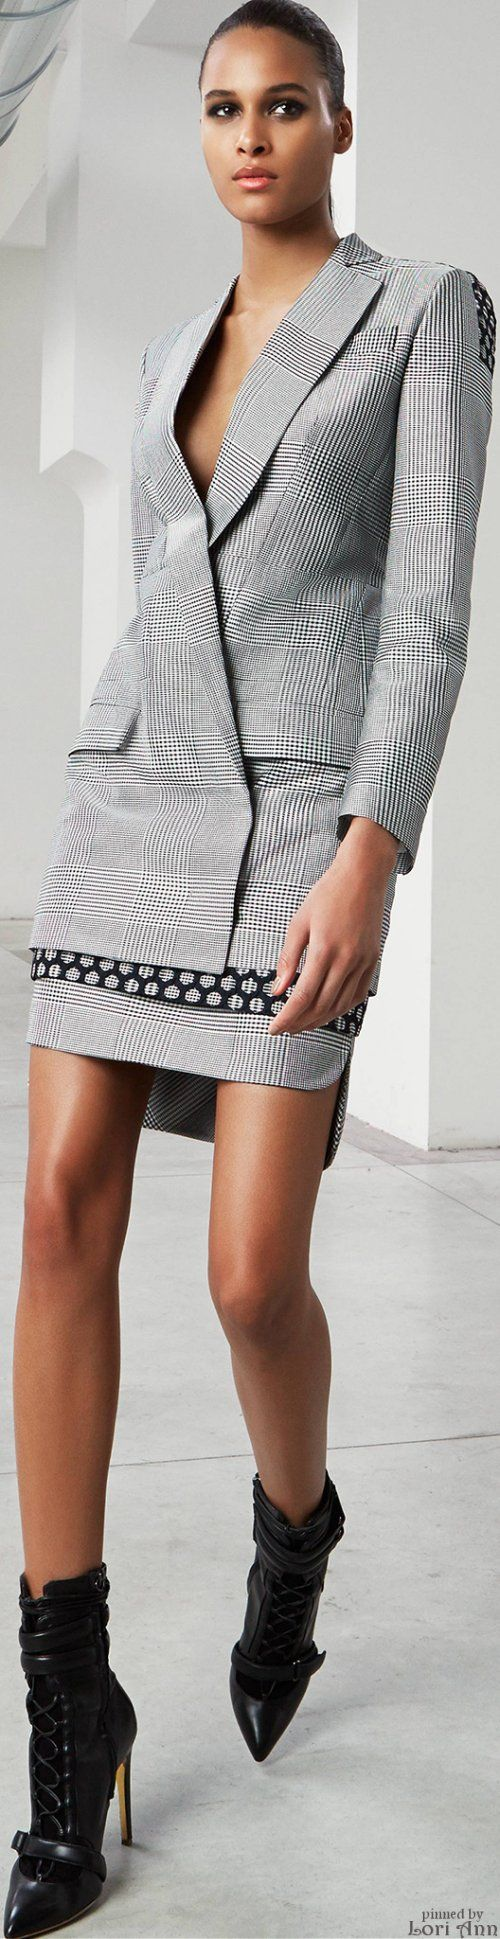 Antonio Berardi Pre-Fall 2015 women fashion outfit clothing style apparel @roressclothes closet ideas